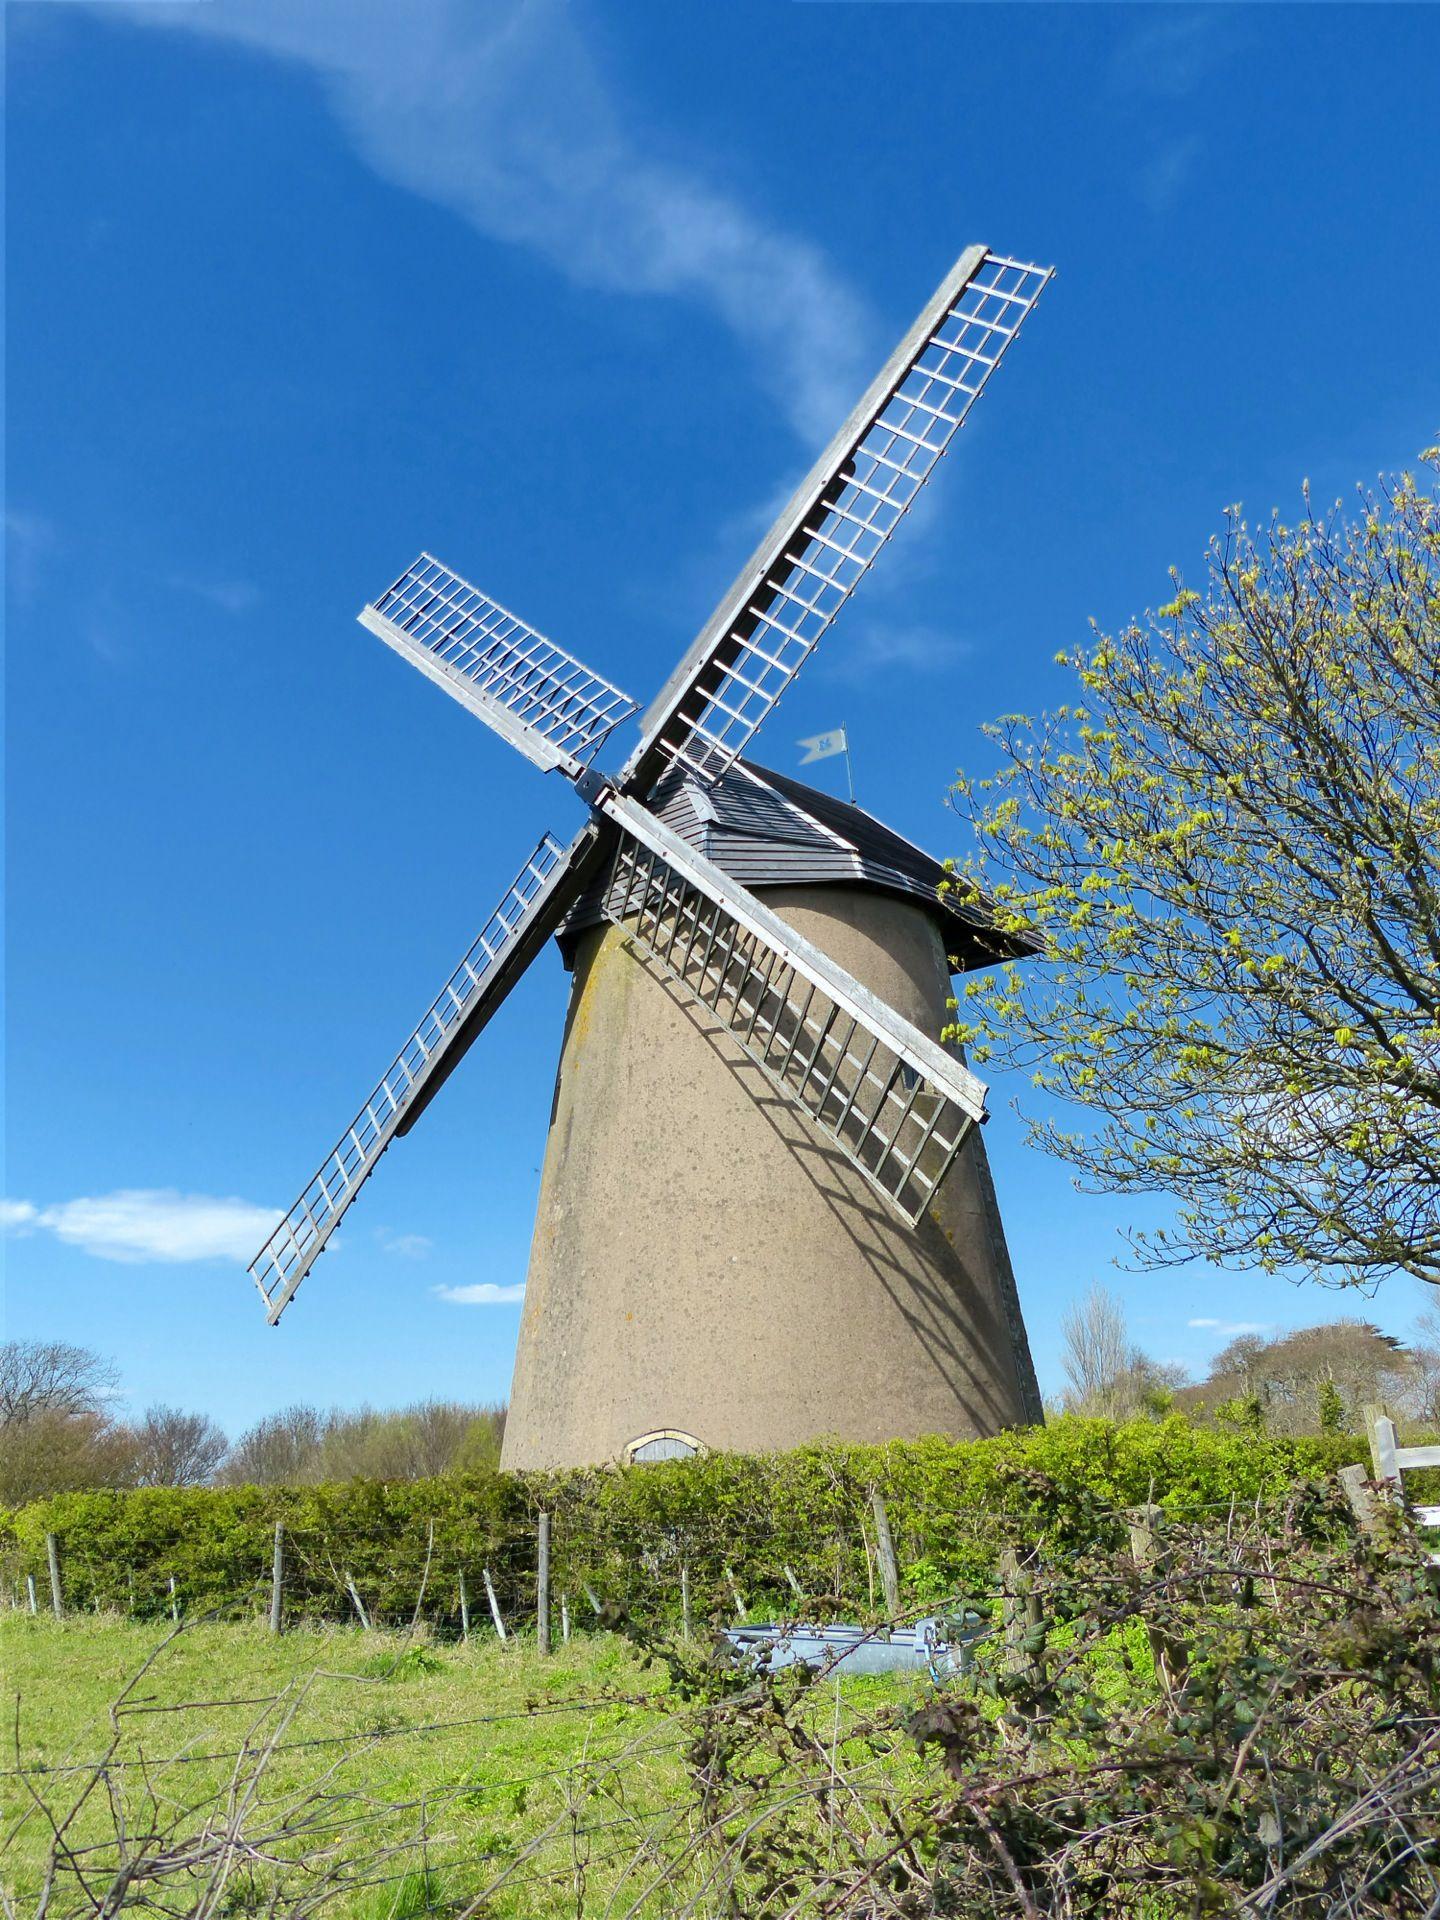 Bembridge Windmill in Bembridge, Isle of Wight